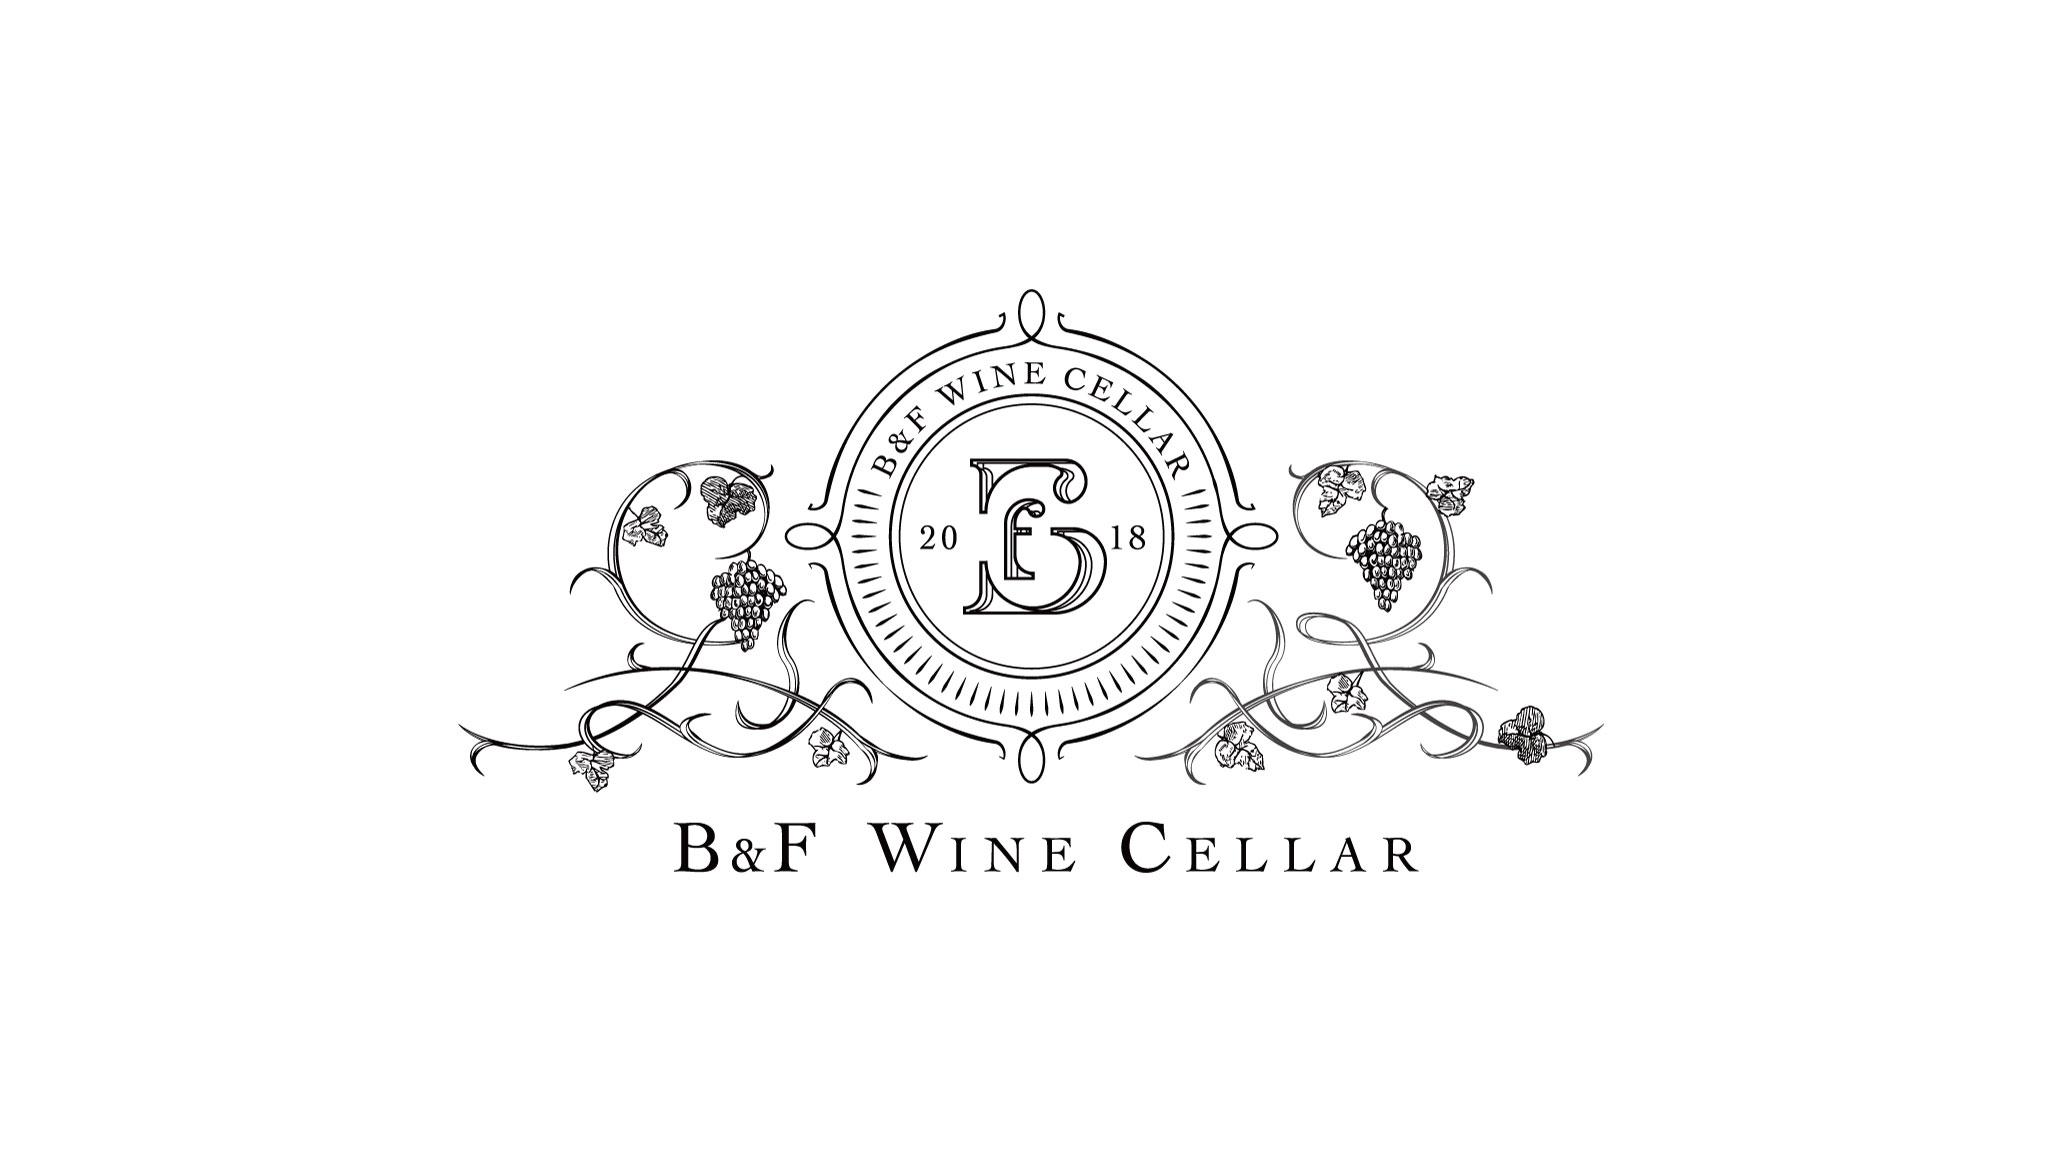 BnF Winecellar